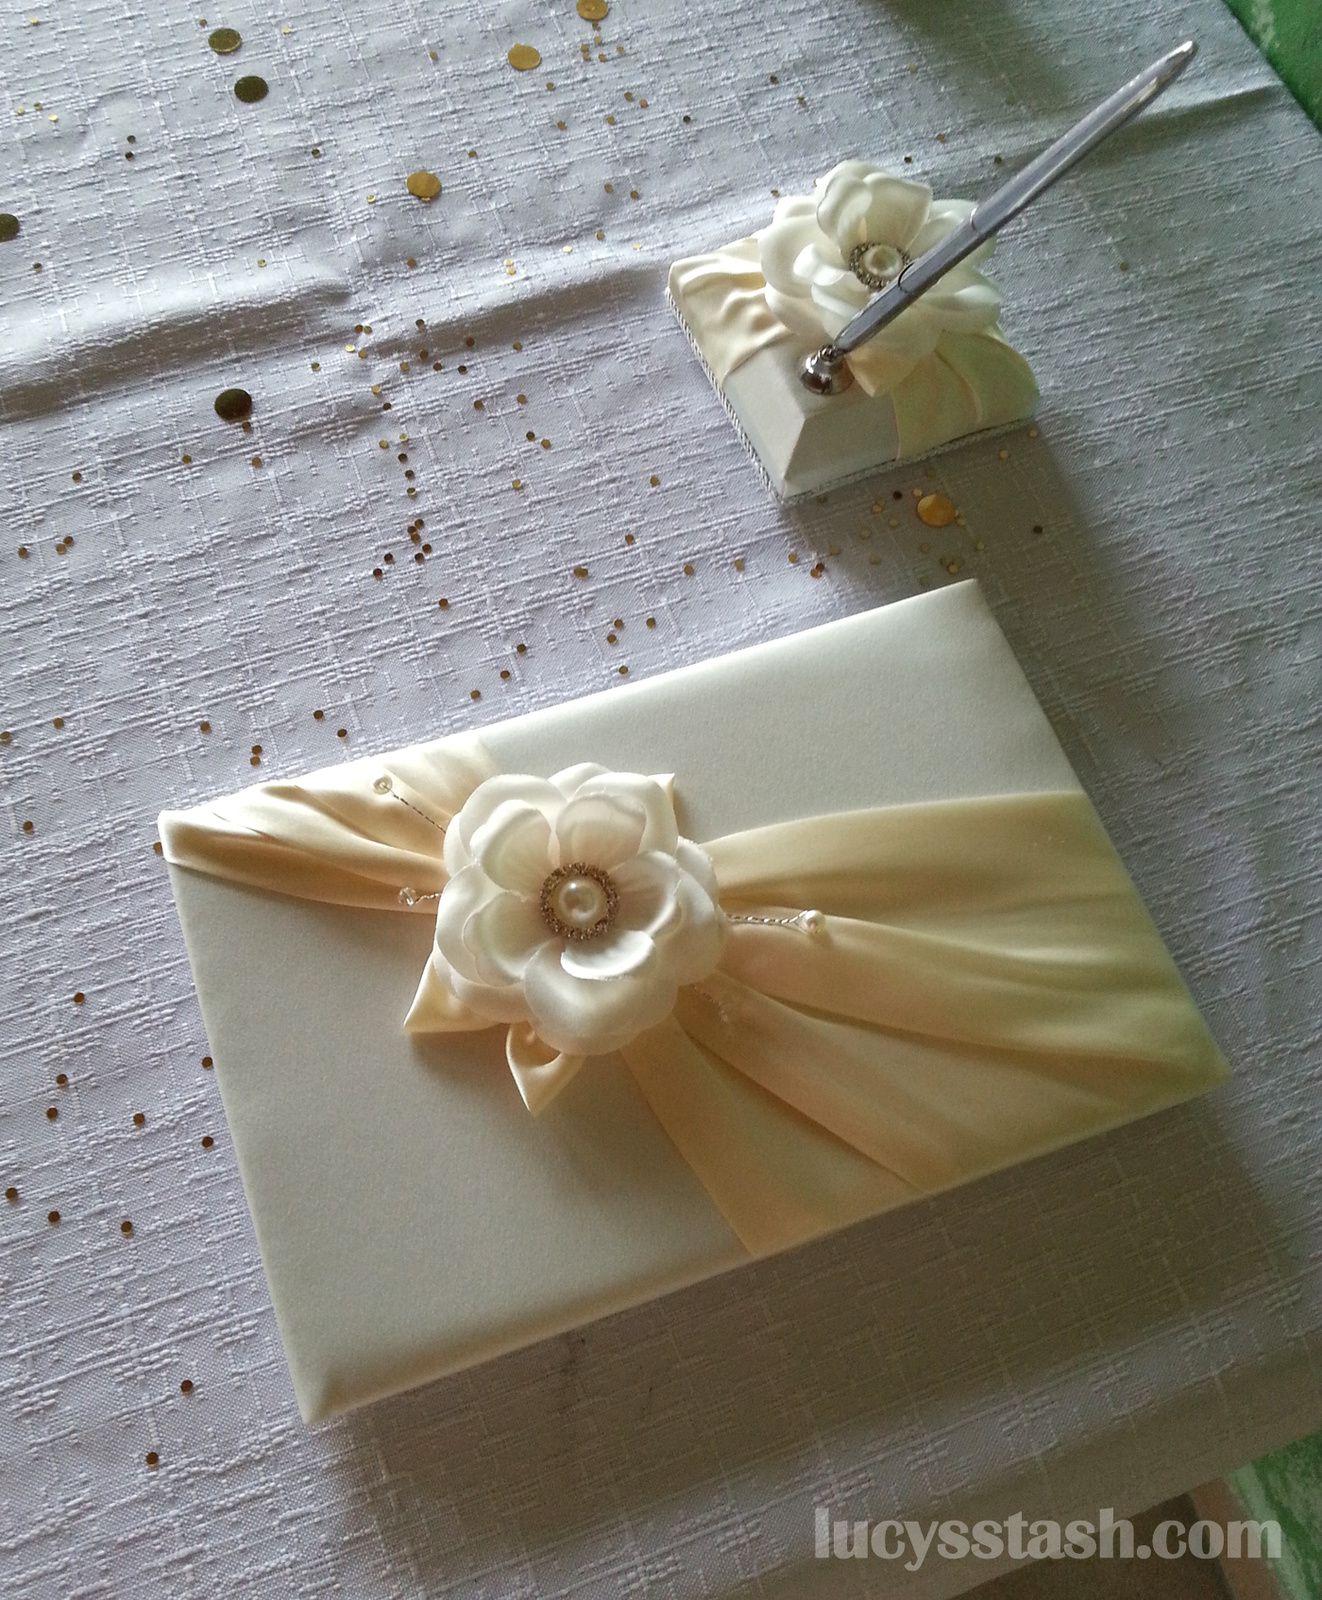 My Wedding Diary - Part 6: THE WEDDING!